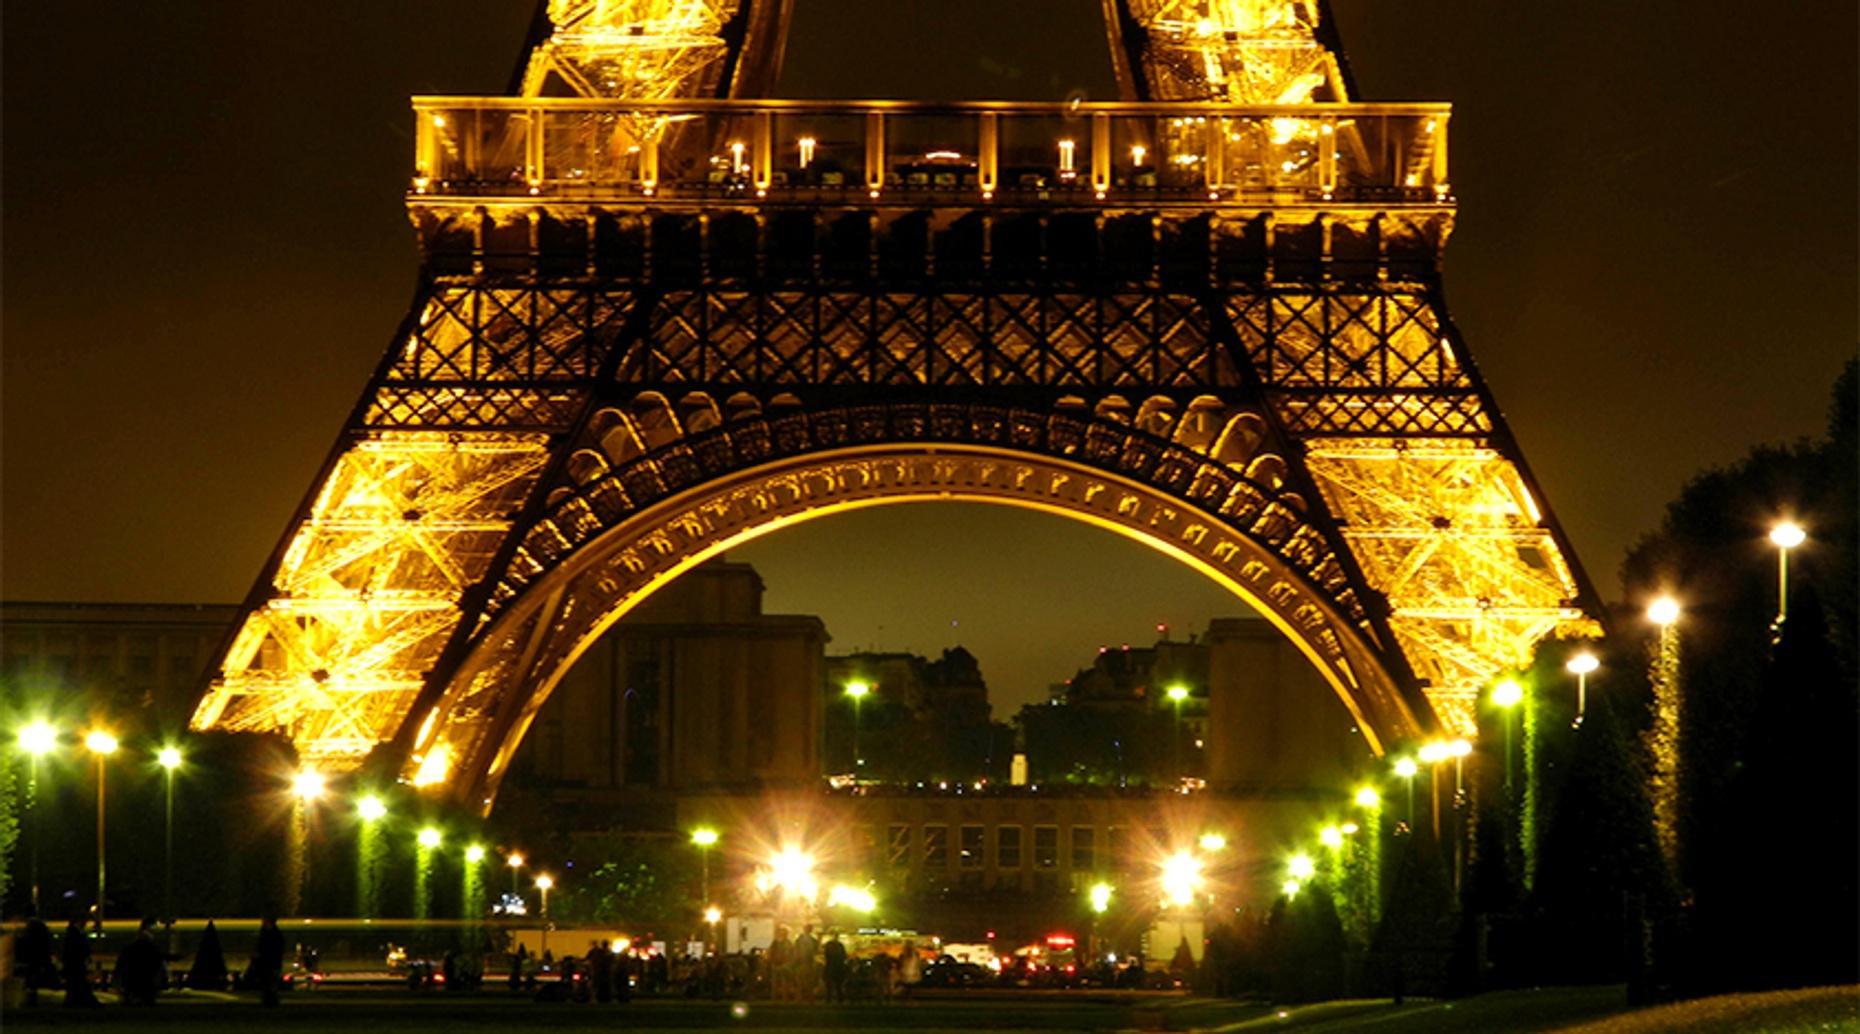 City of Lights Tour in Paris